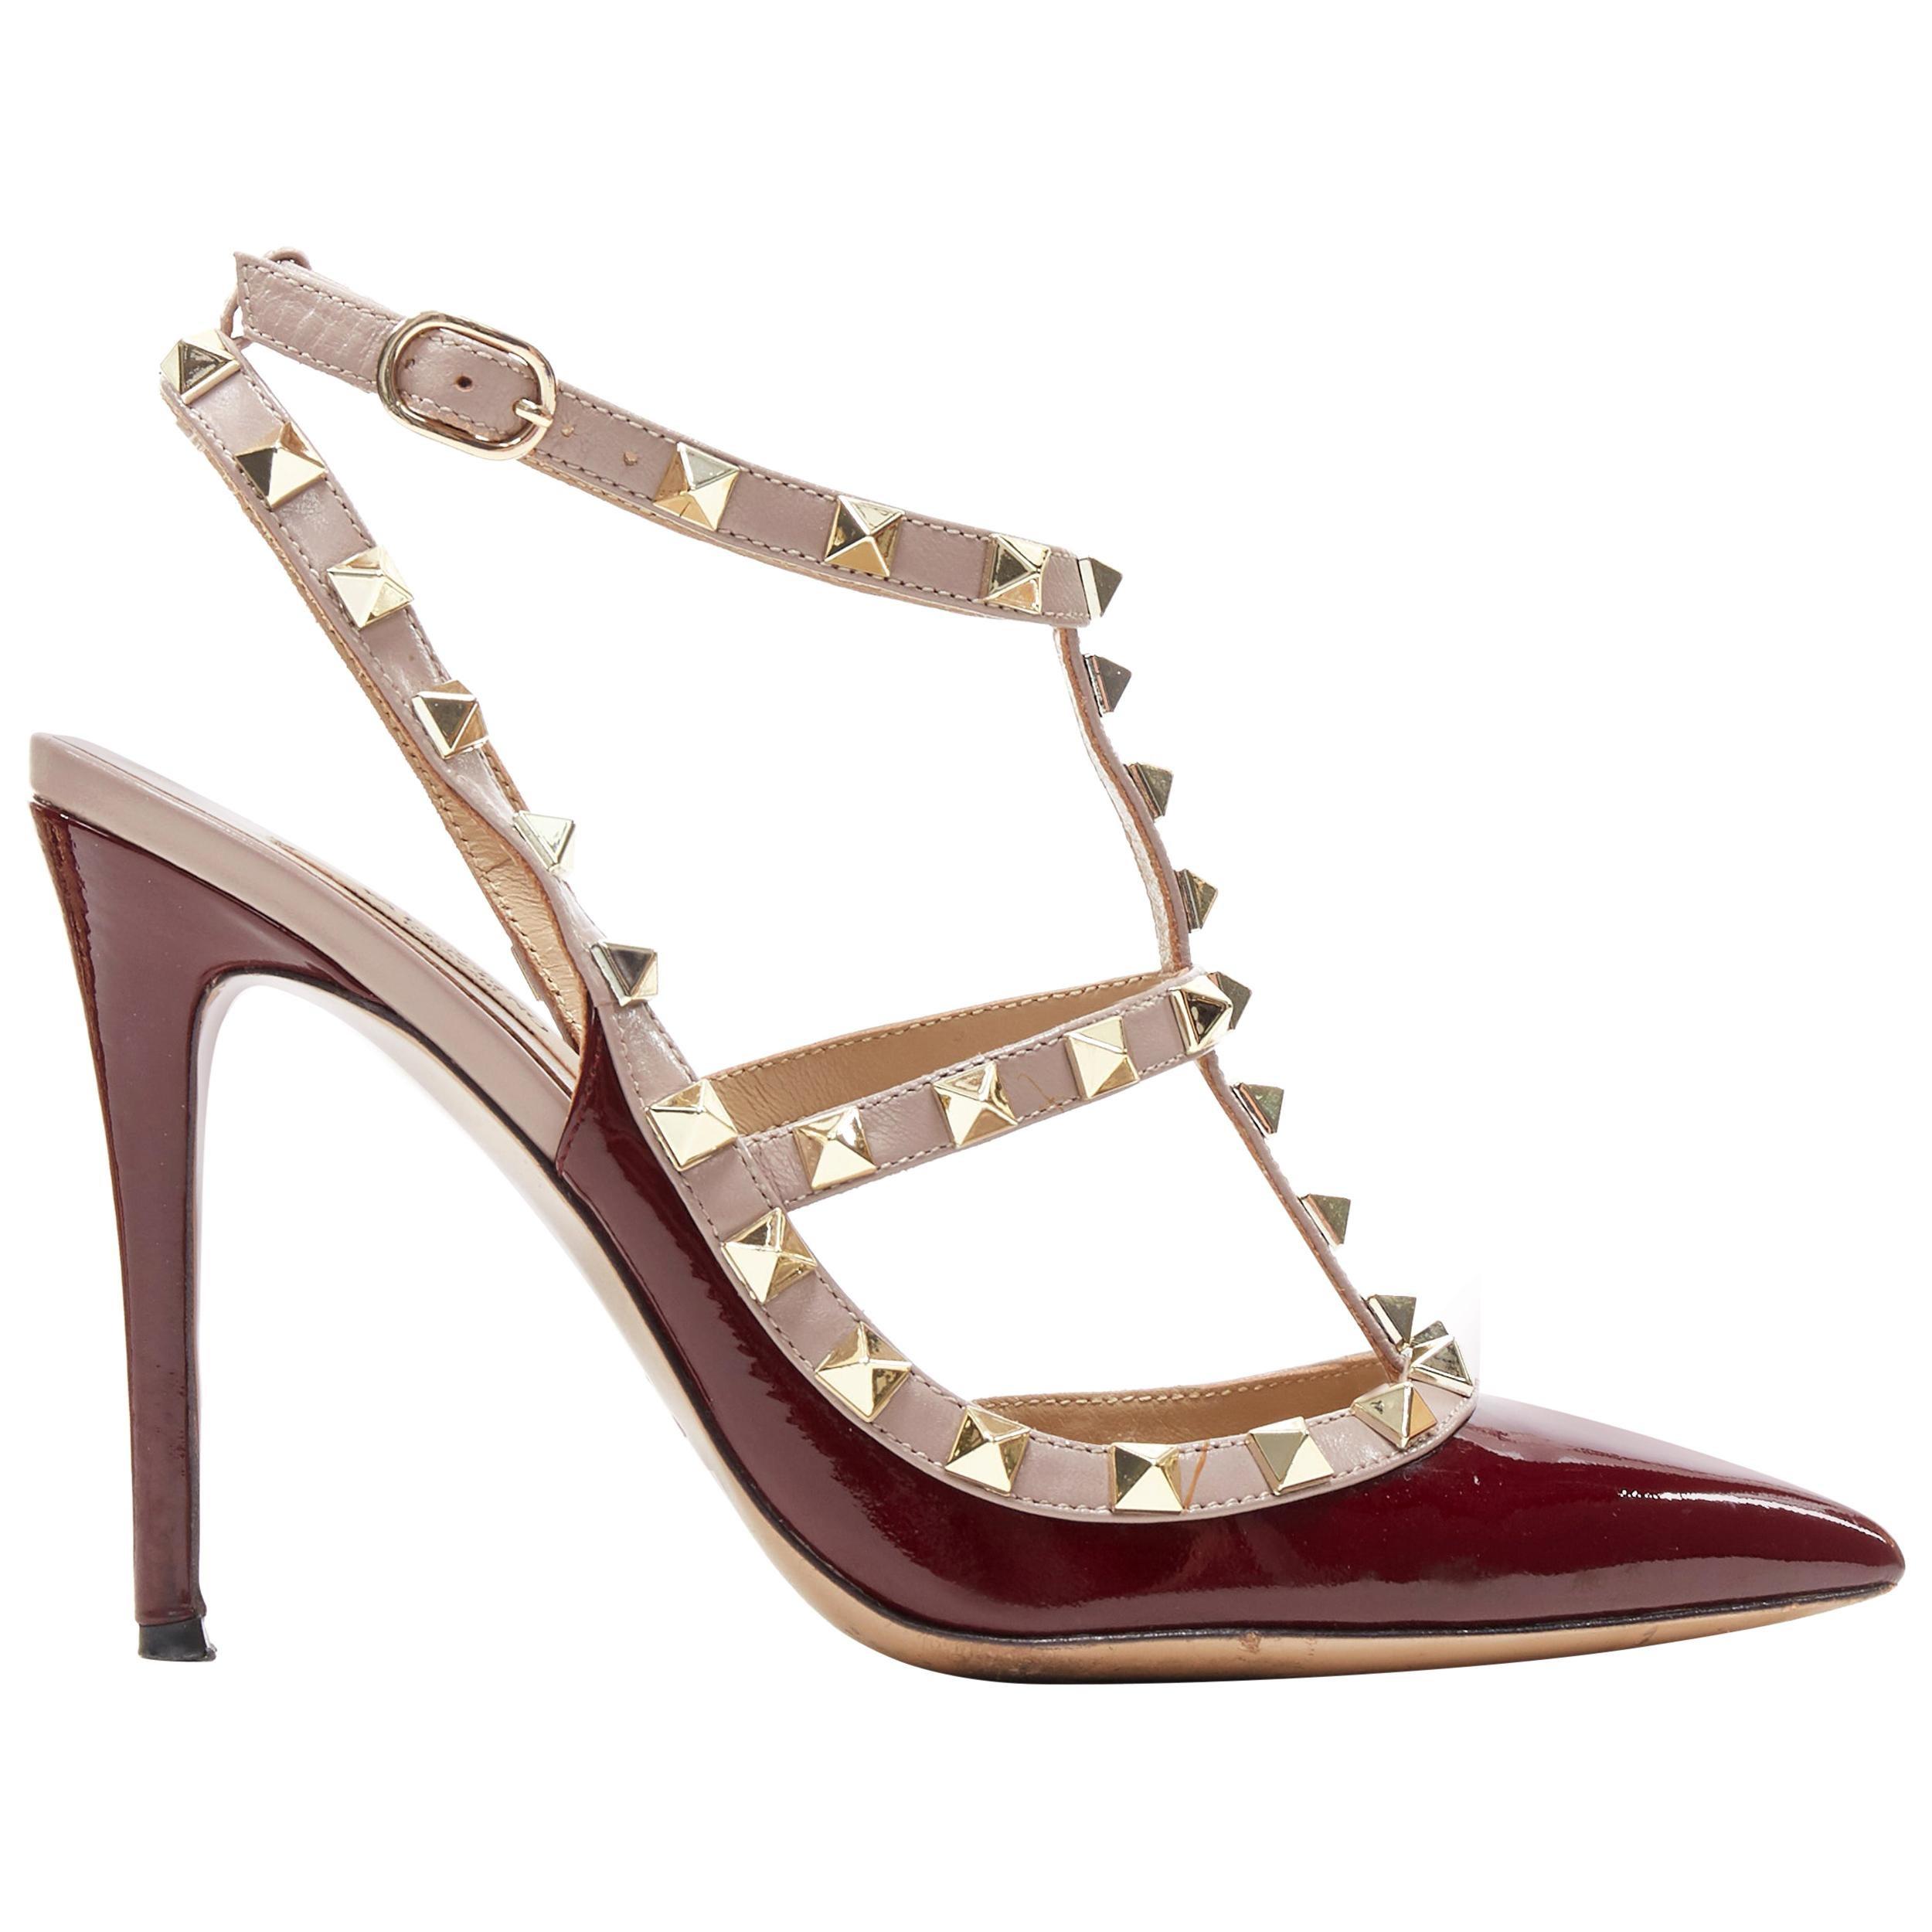 VALENTINO Rockstud burgundy red patent gold studded caged point toe heel EU39